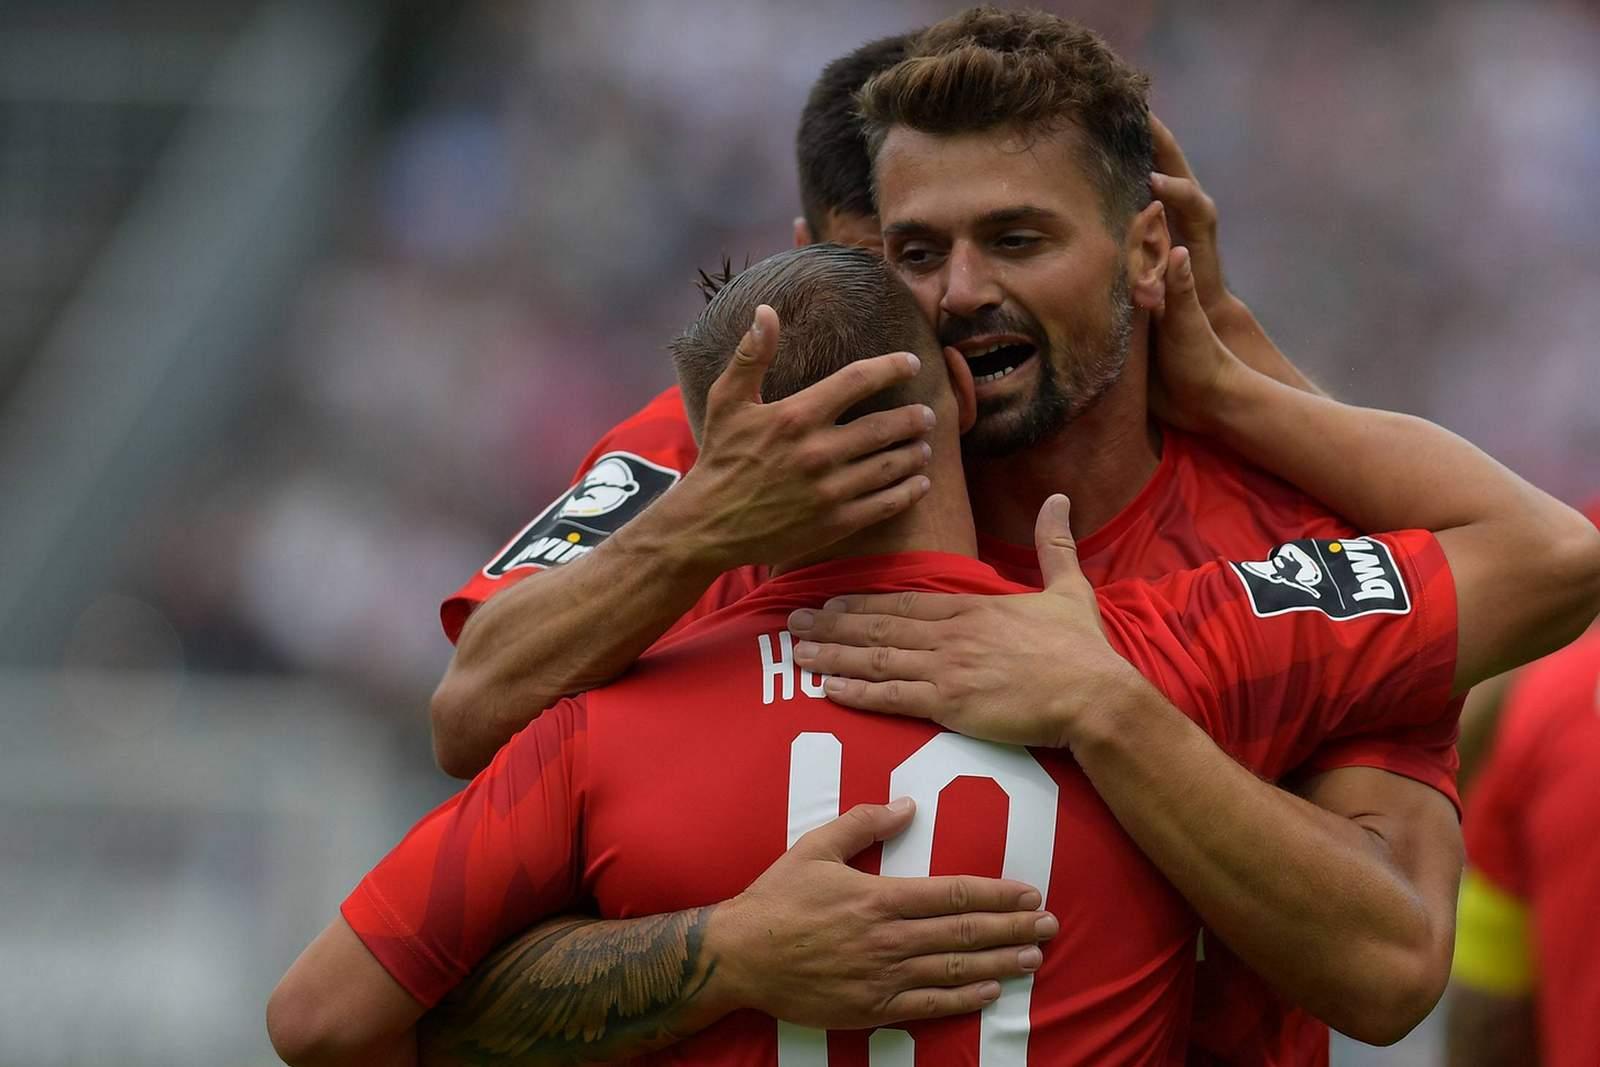 Albert Bunjaku jubelt nach Tor gegen Chemnitzer FC